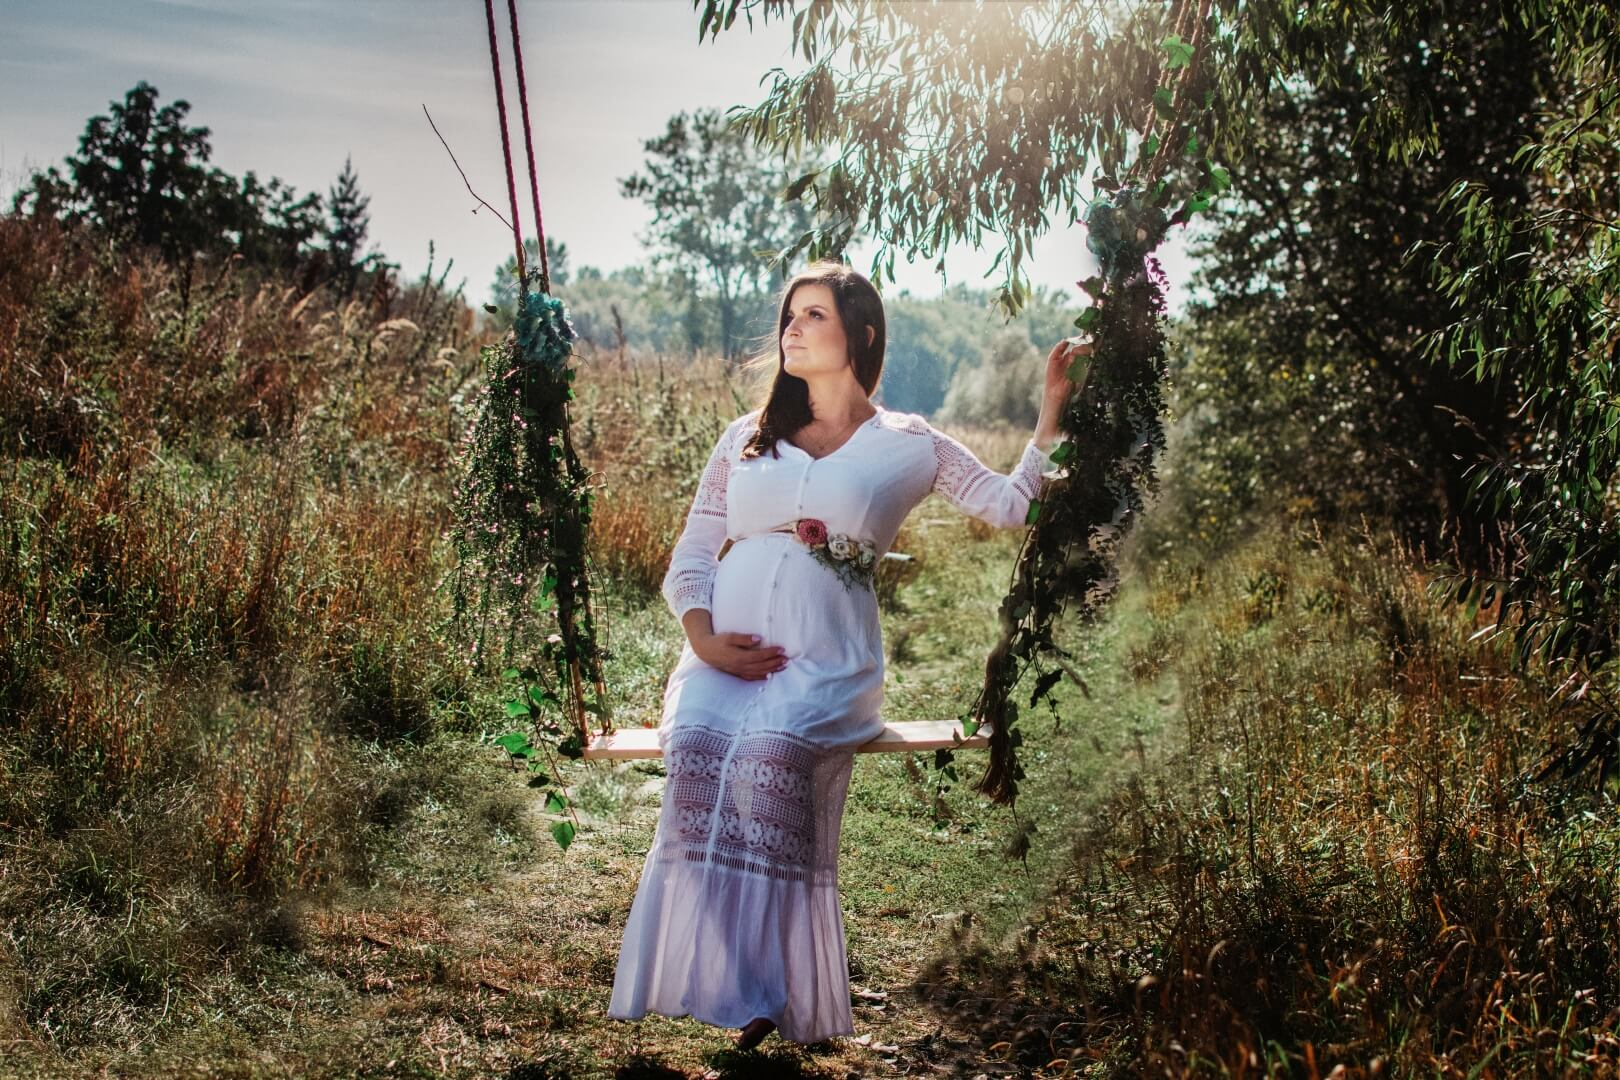 Zdjęcie ciążowe na huśtawce 01